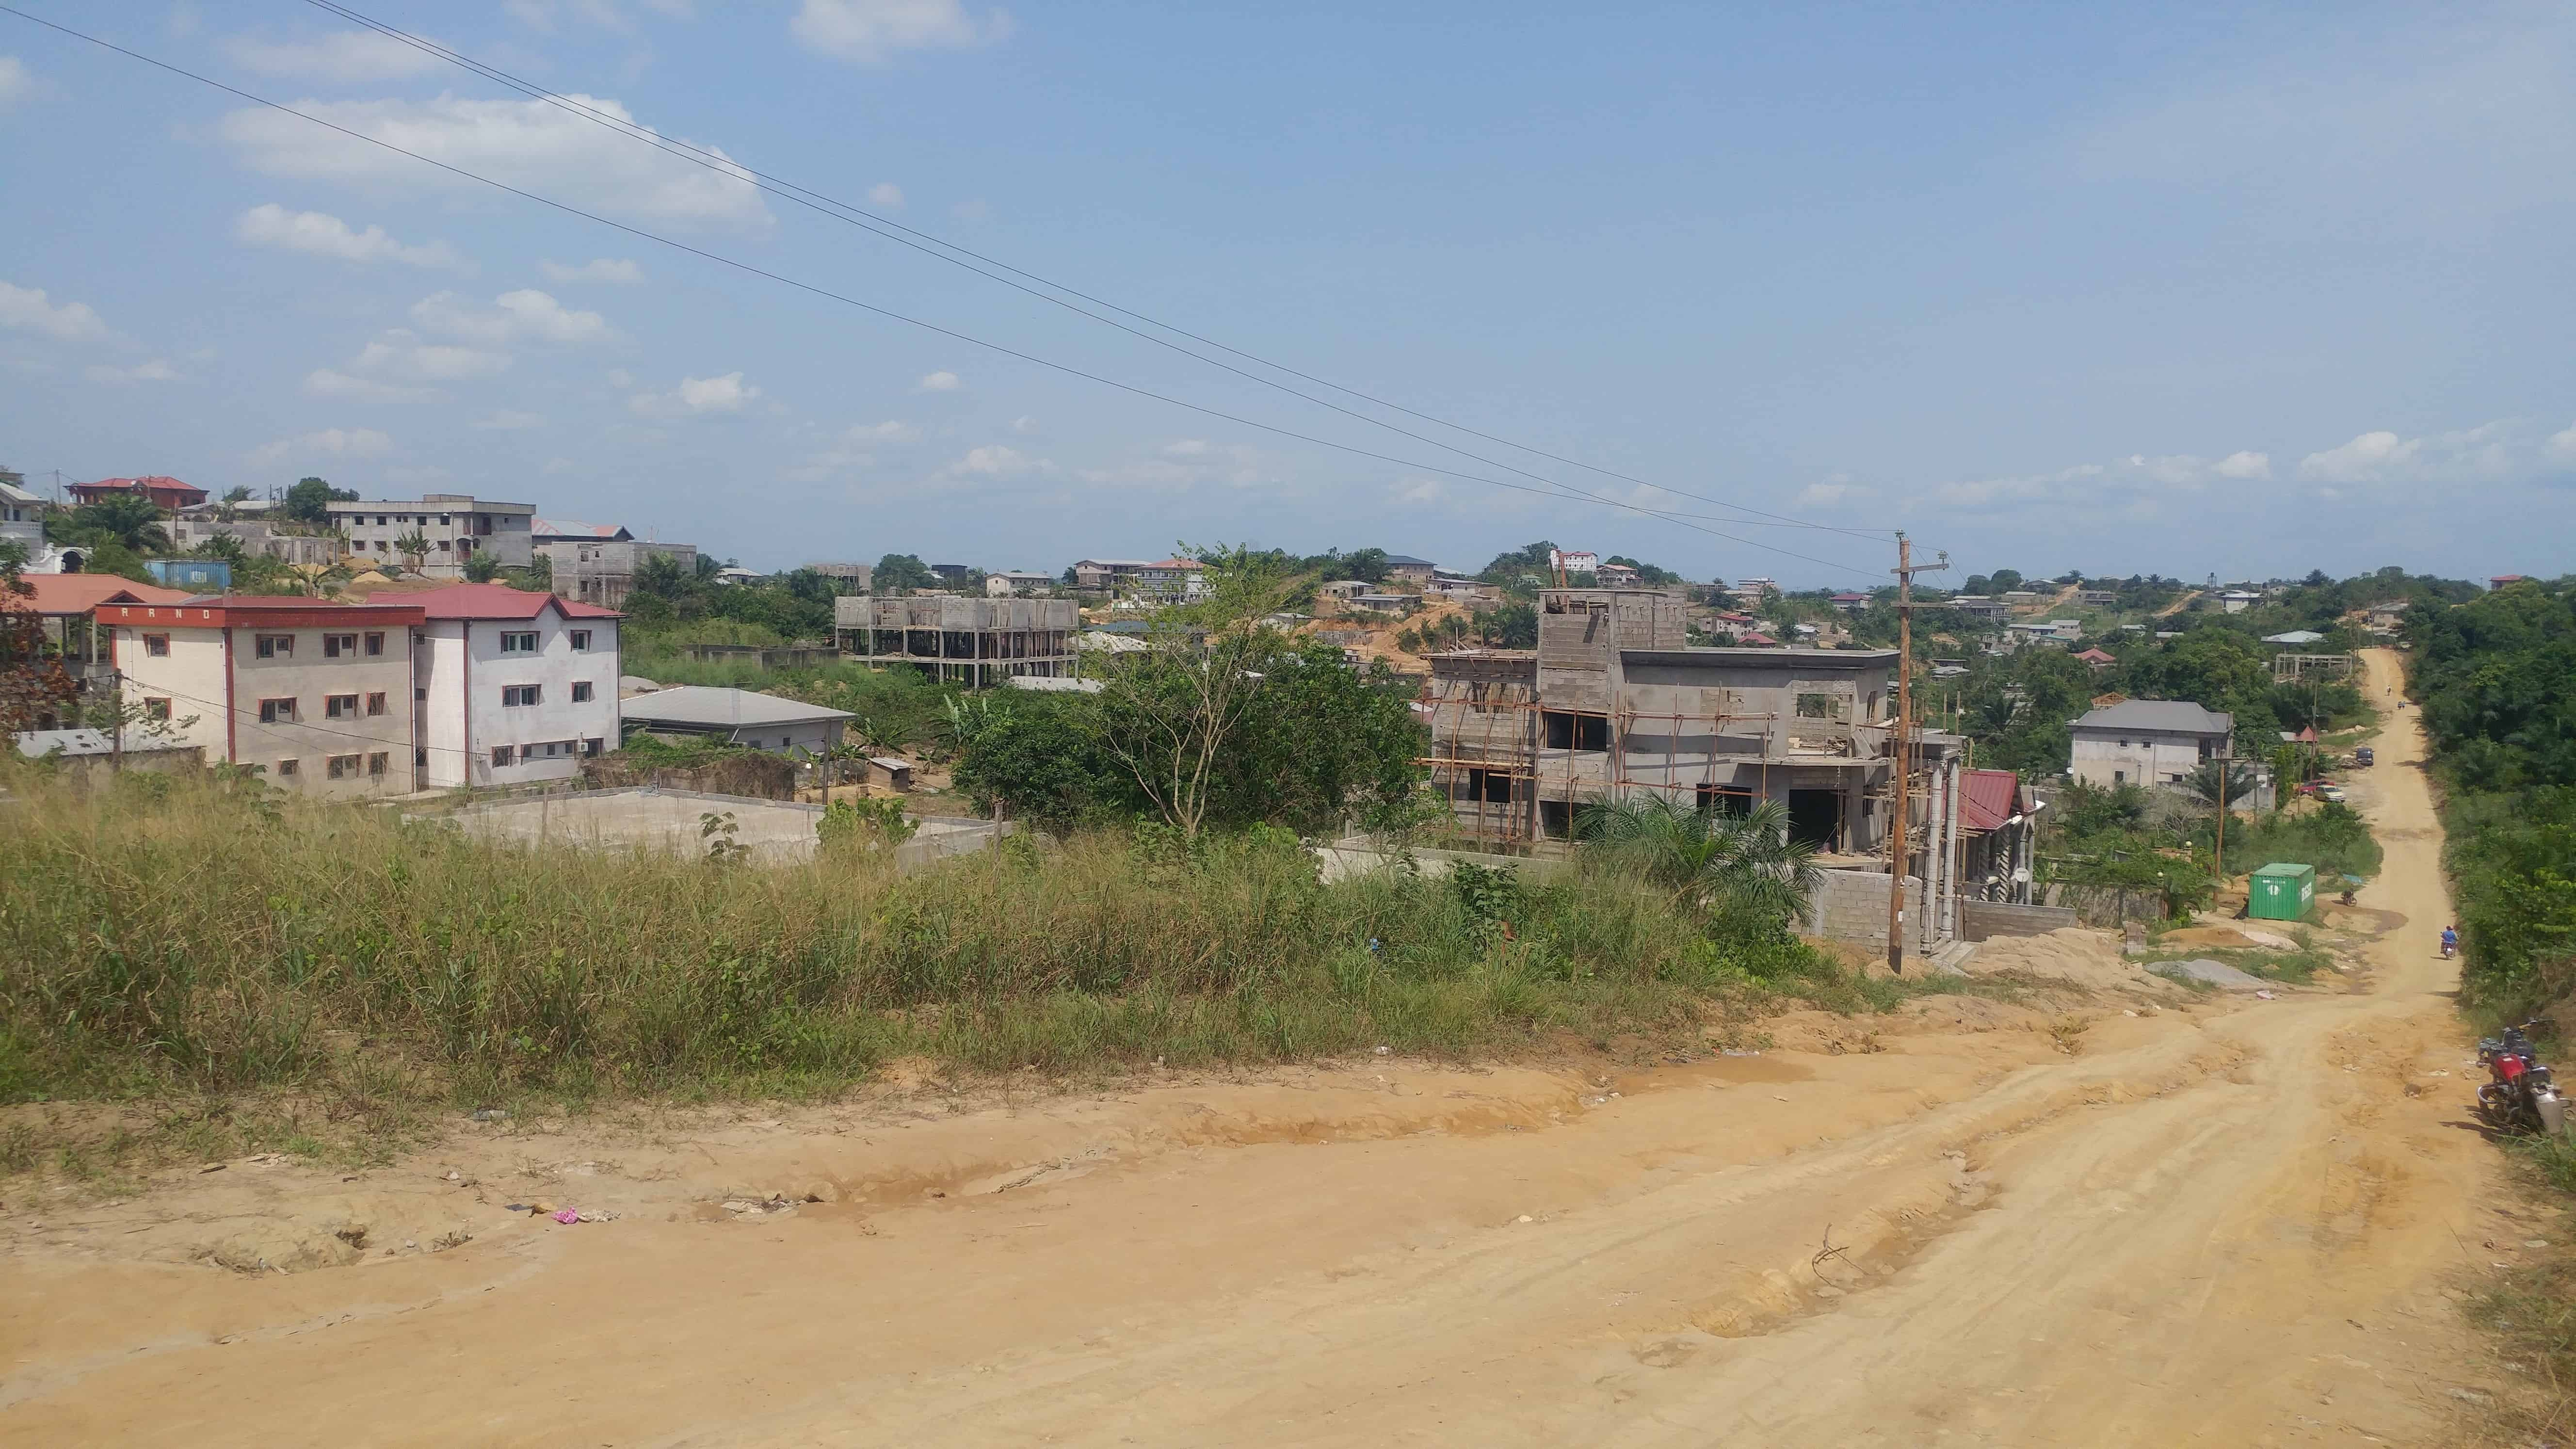 Terrain à vendre - Douala, Nyala Bassa, PK 12 génie militaire - 70000 m2 - 7 500 000 FCFA